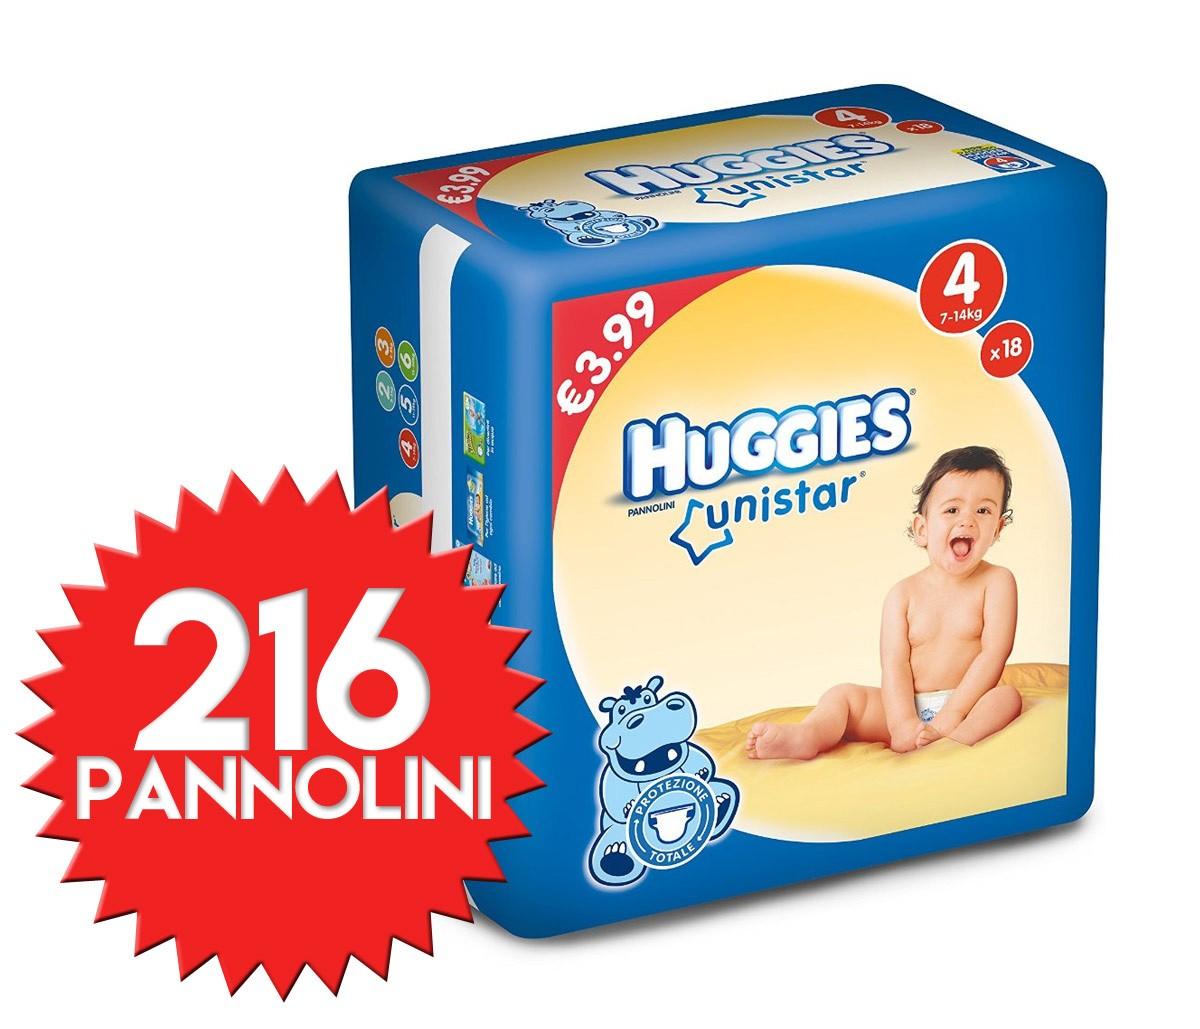 Pannolini Huggies Unistar Misura 4 - 216 pezzi